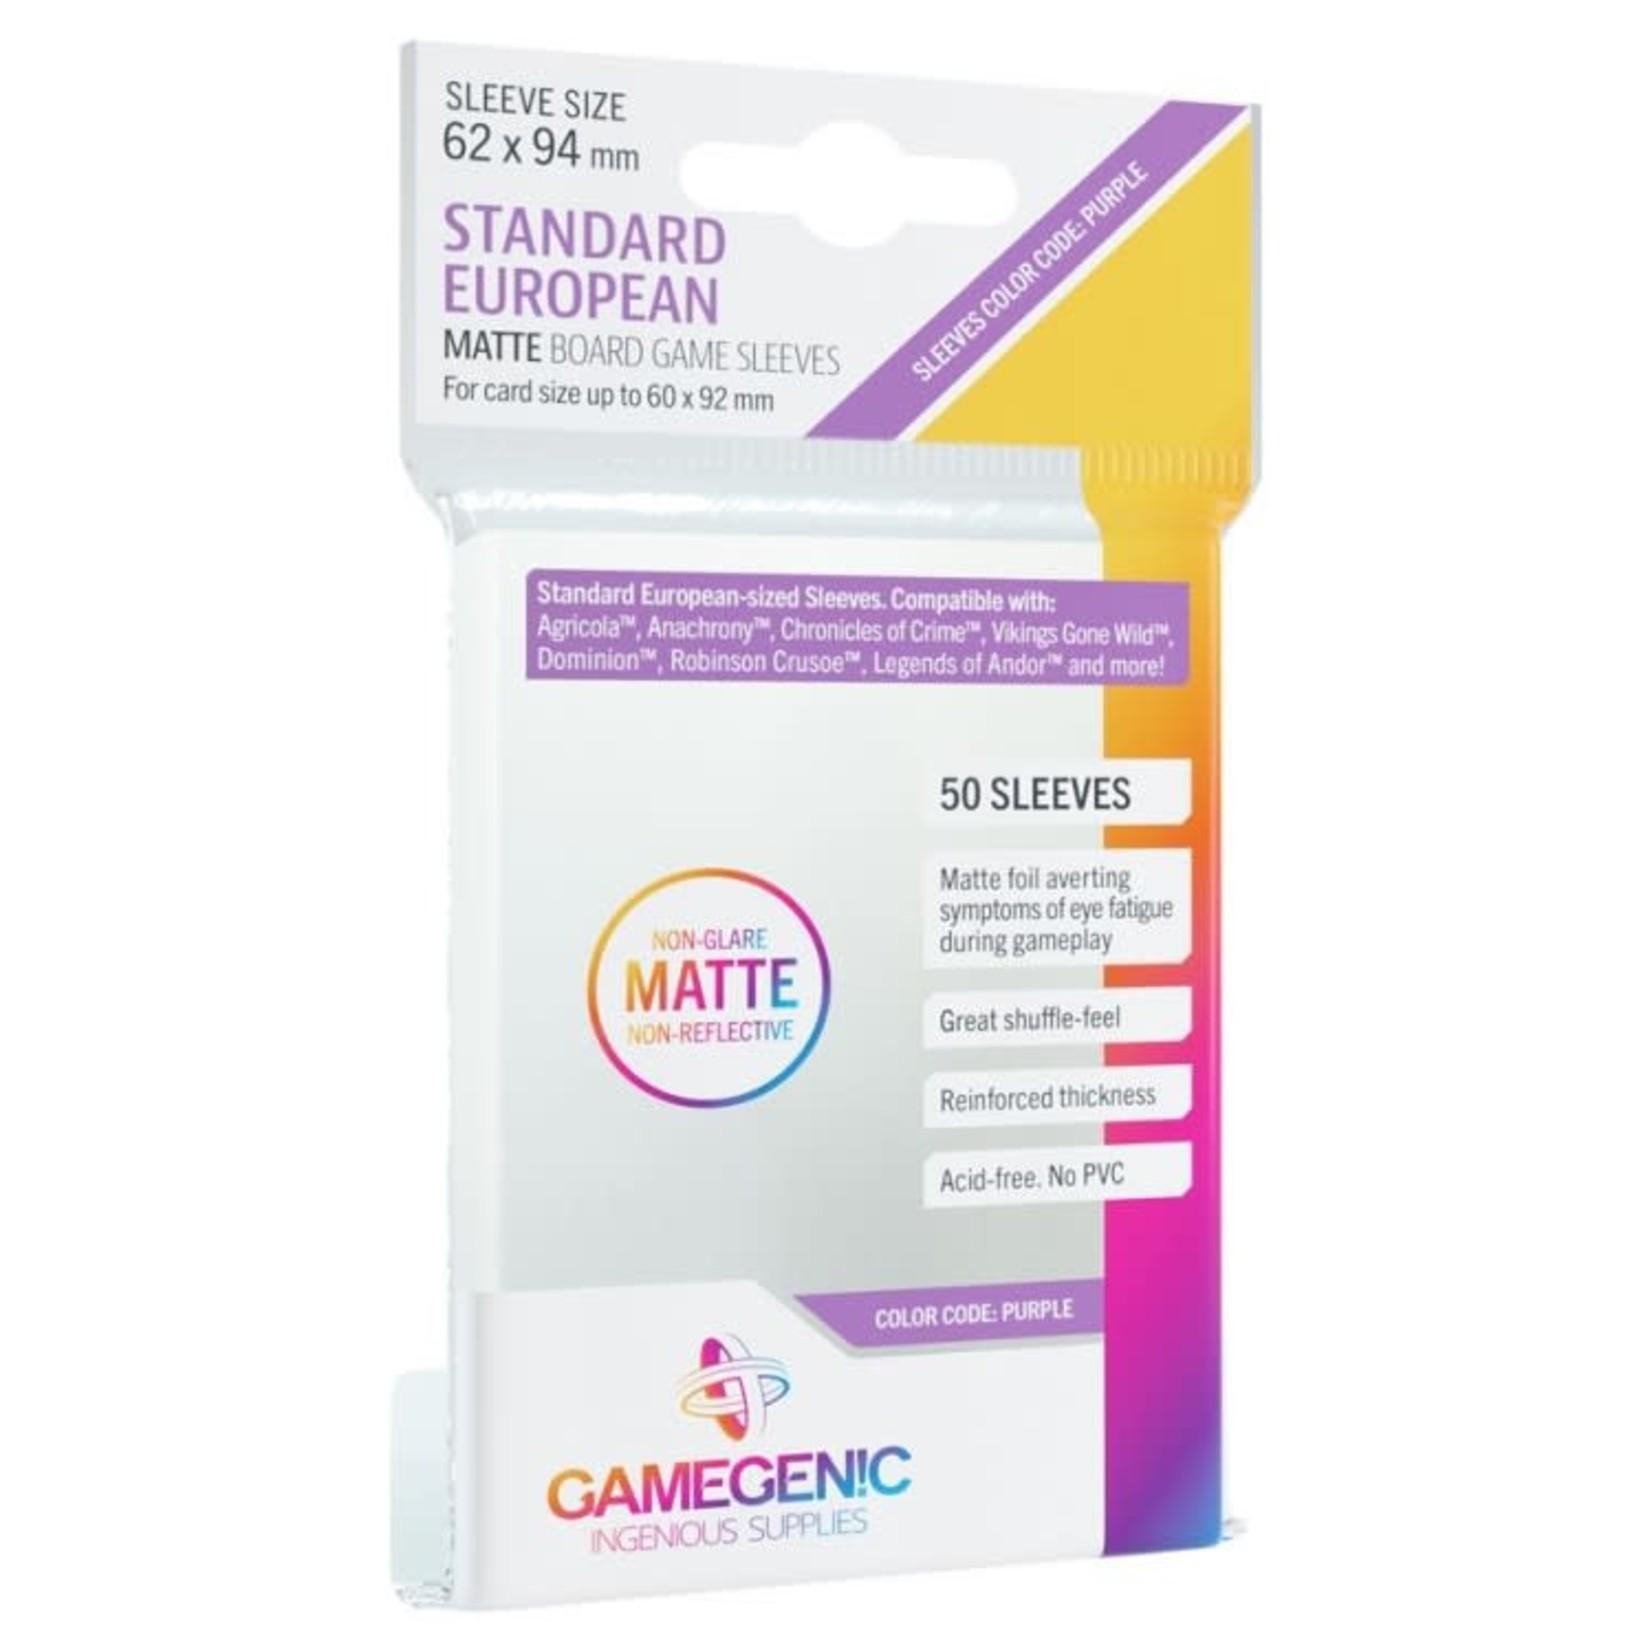 Gamegenic Gamegenic Sleeves: Standard European MATTE - 50 count (62x94mm)